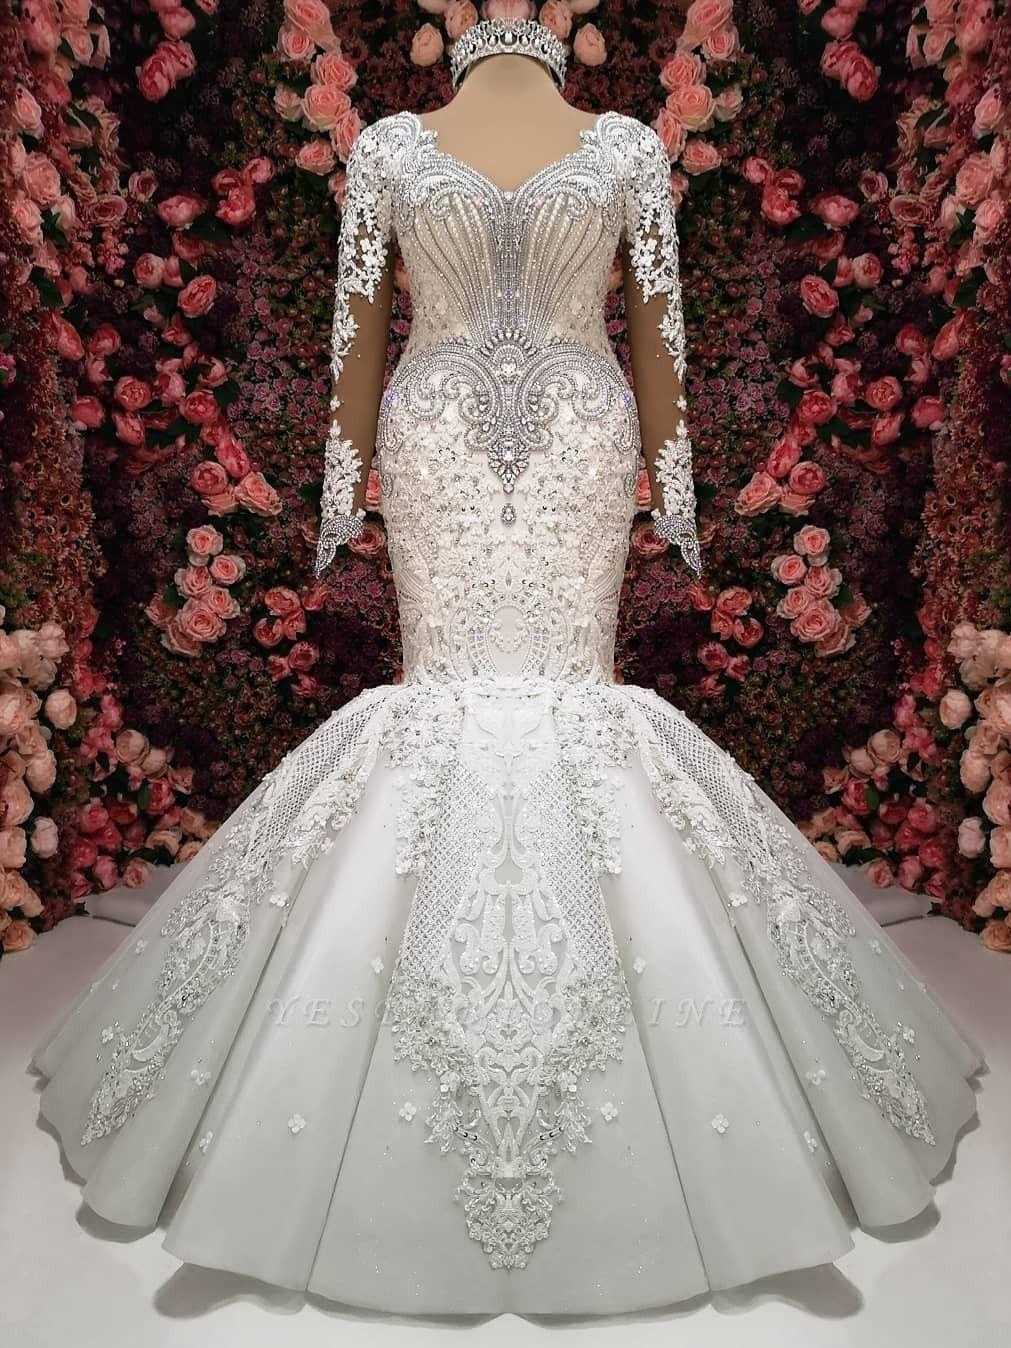 Charming Crystals Mermaid Bridal Gowns Long Sleeves